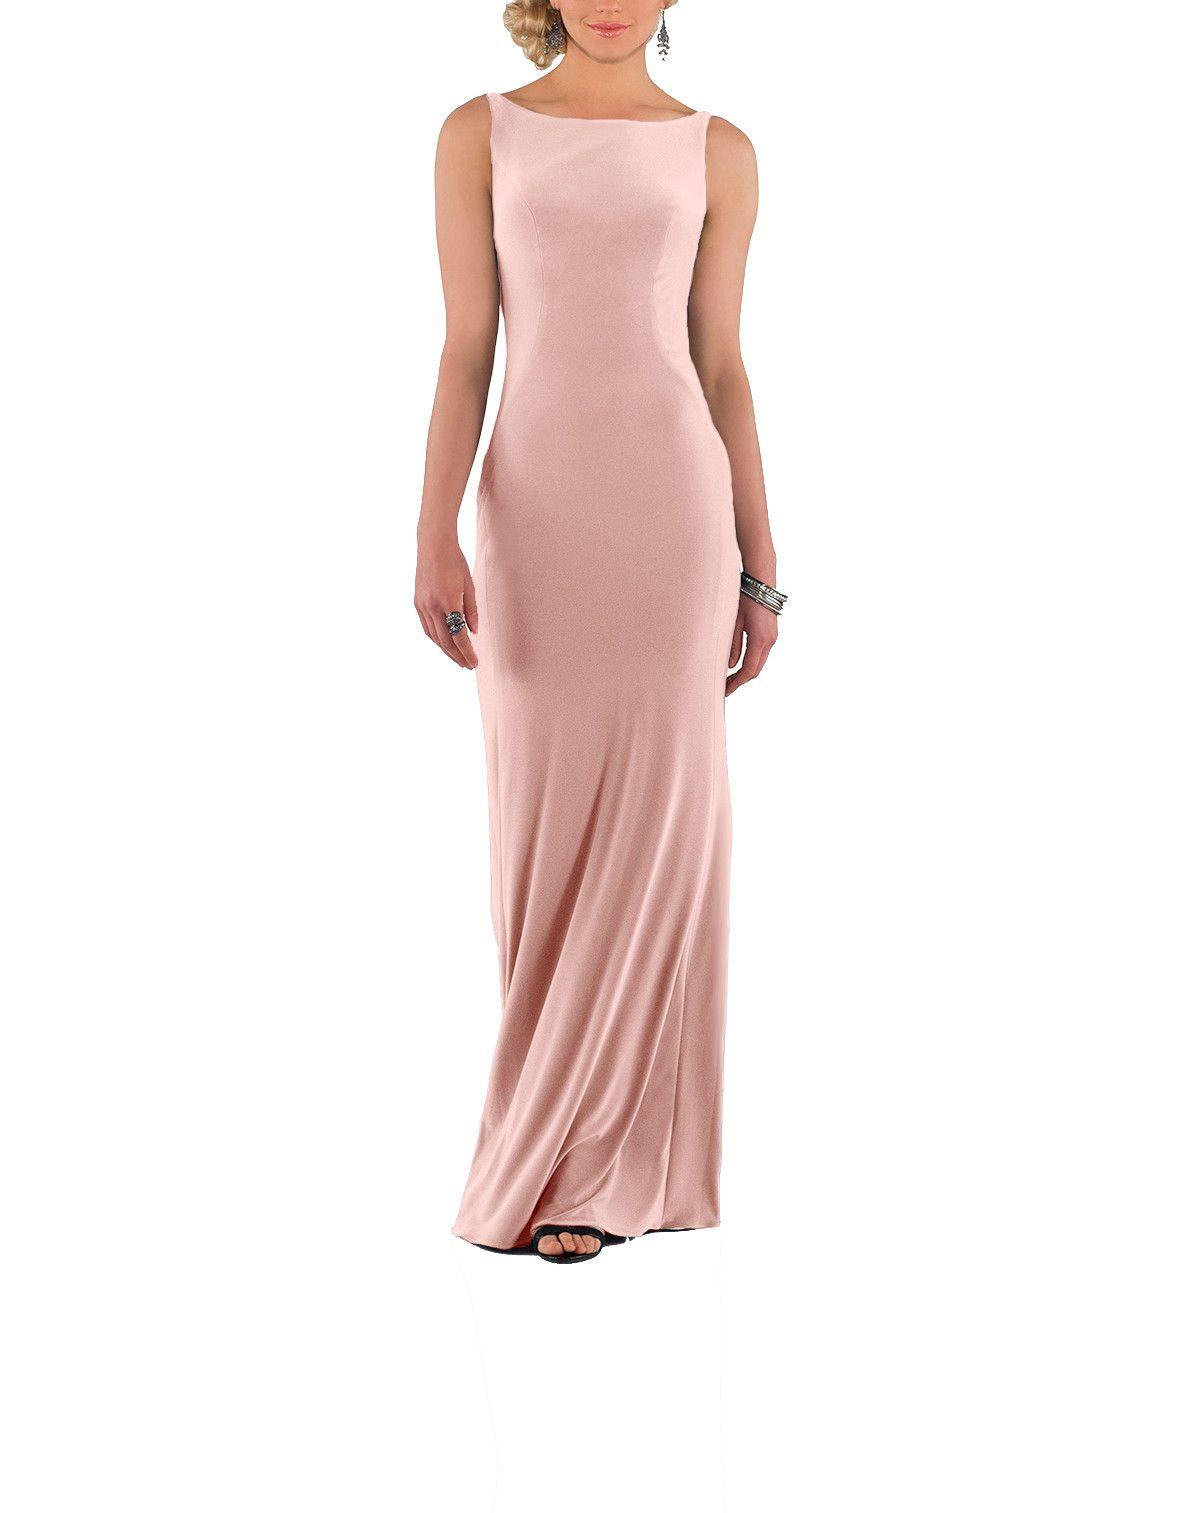 Sorella vita style stella york dress collection and gowns